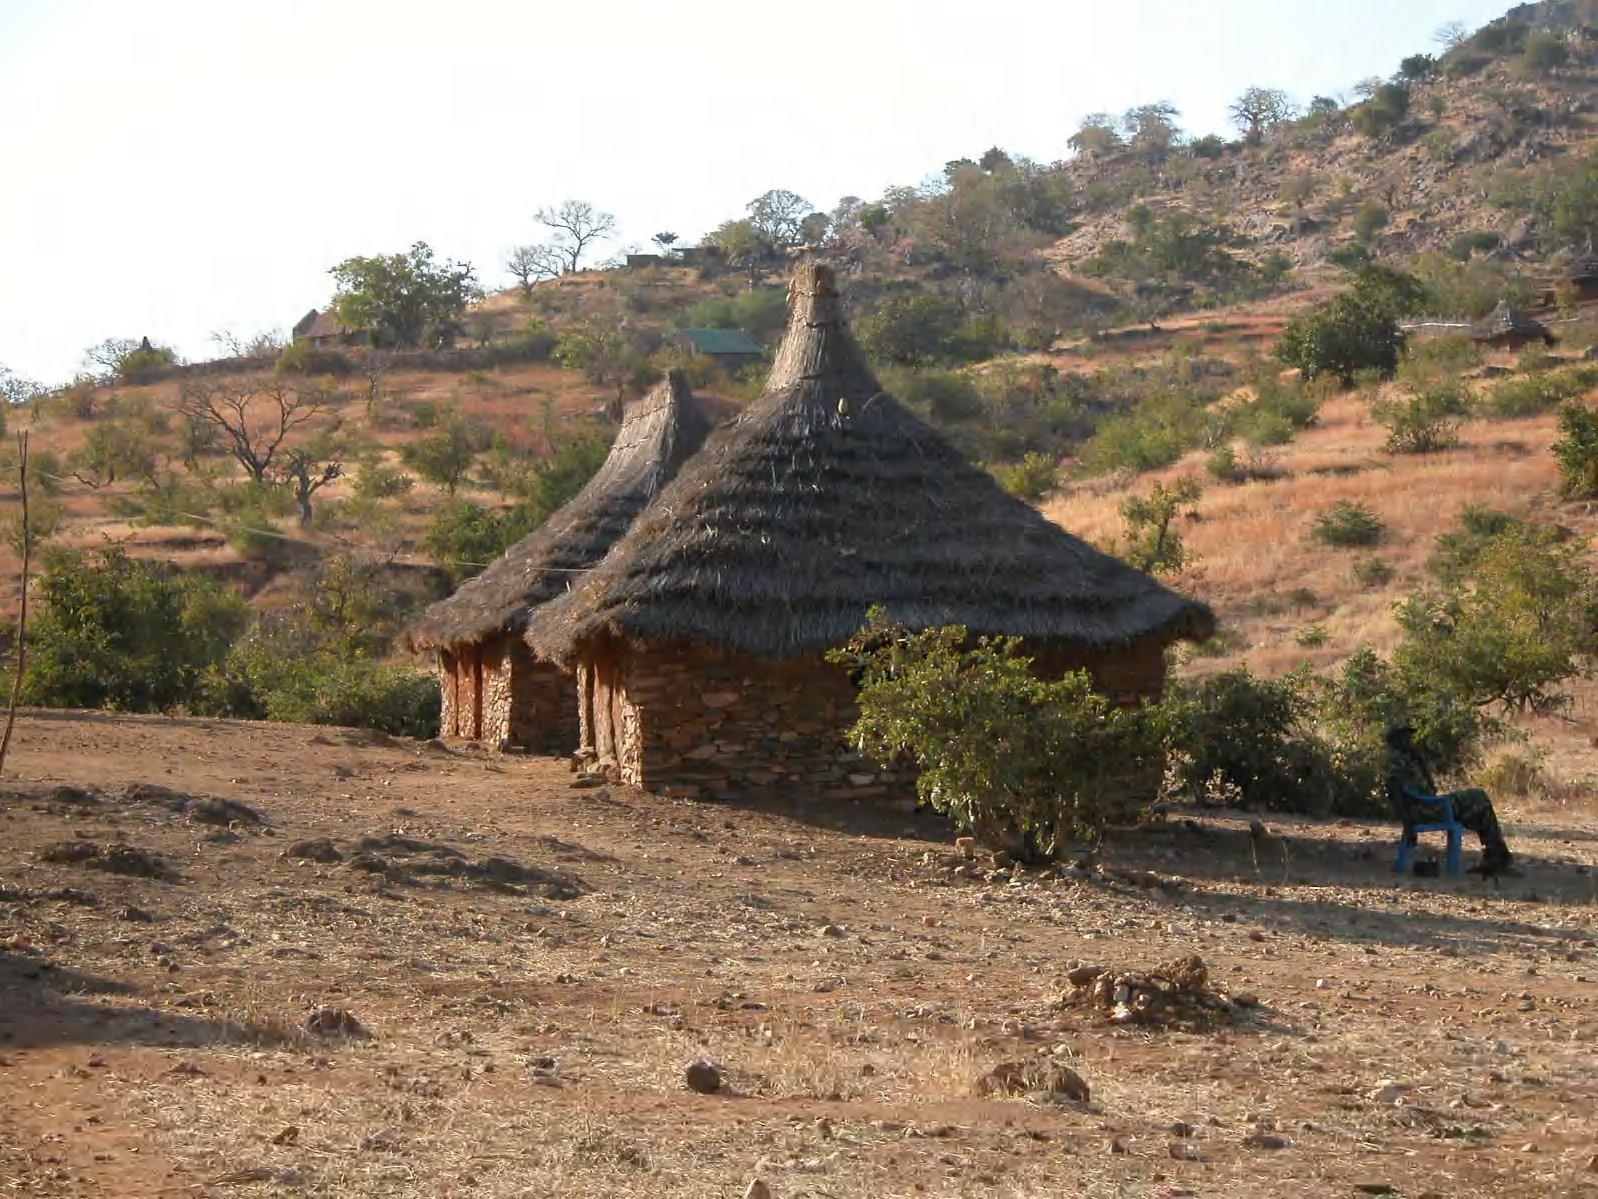 View of the Nuba Mountains near Kauda and Kwere, Southern Kordofan province, Sudan